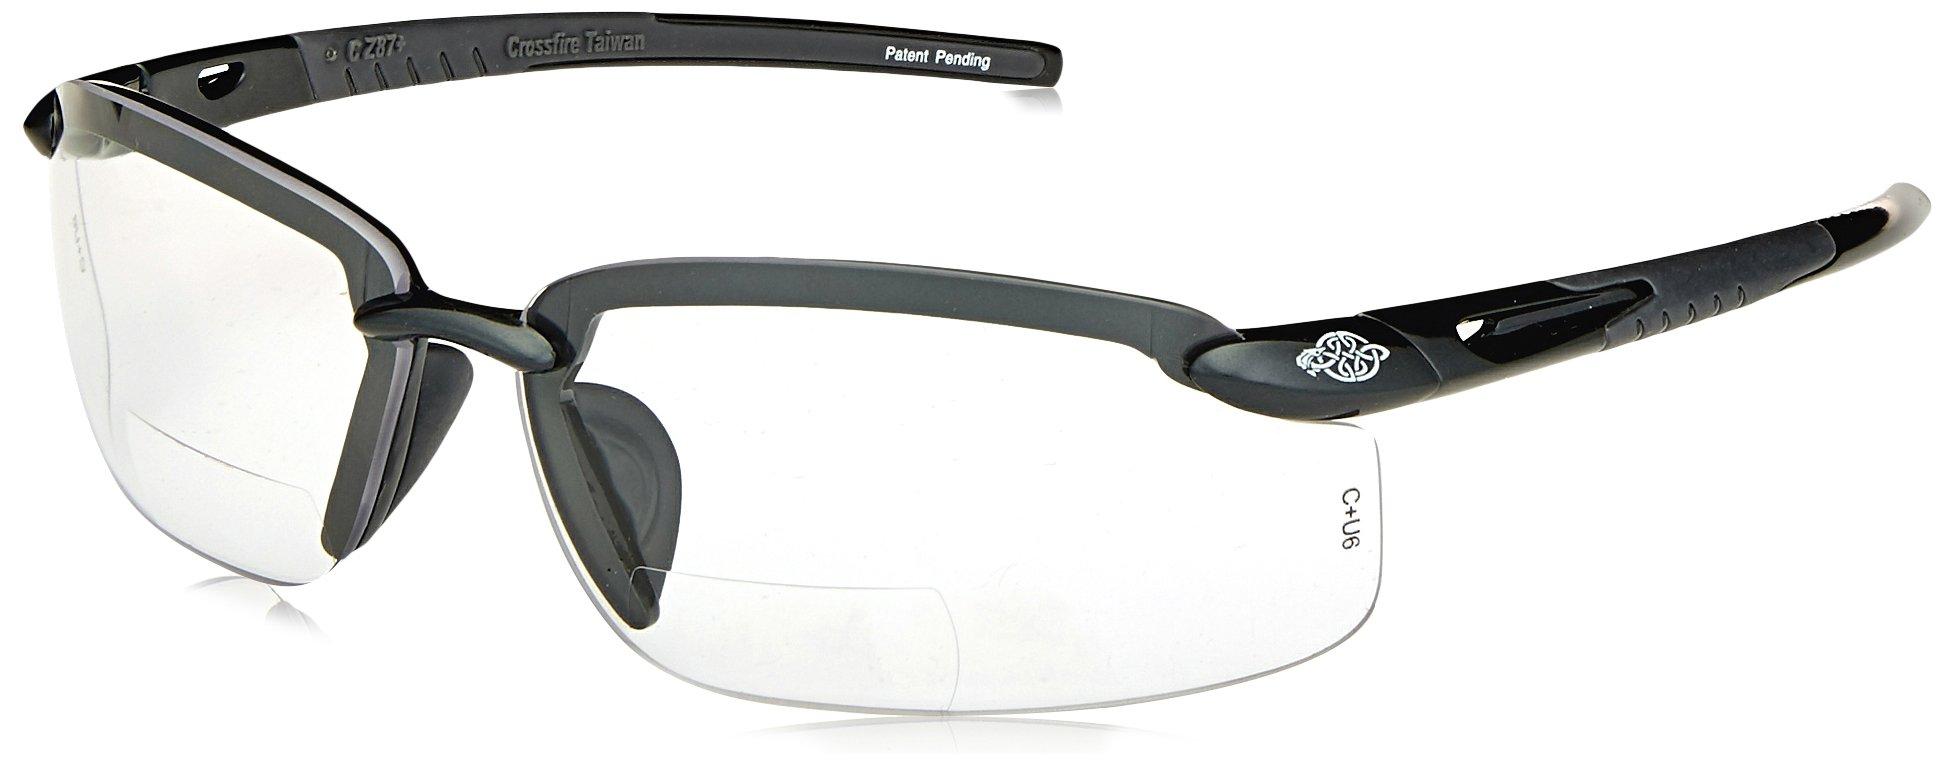 ES5 Reader Crossfire Safety Polarized Smoke Lens Diopter 2.5 Crystal Black Frame